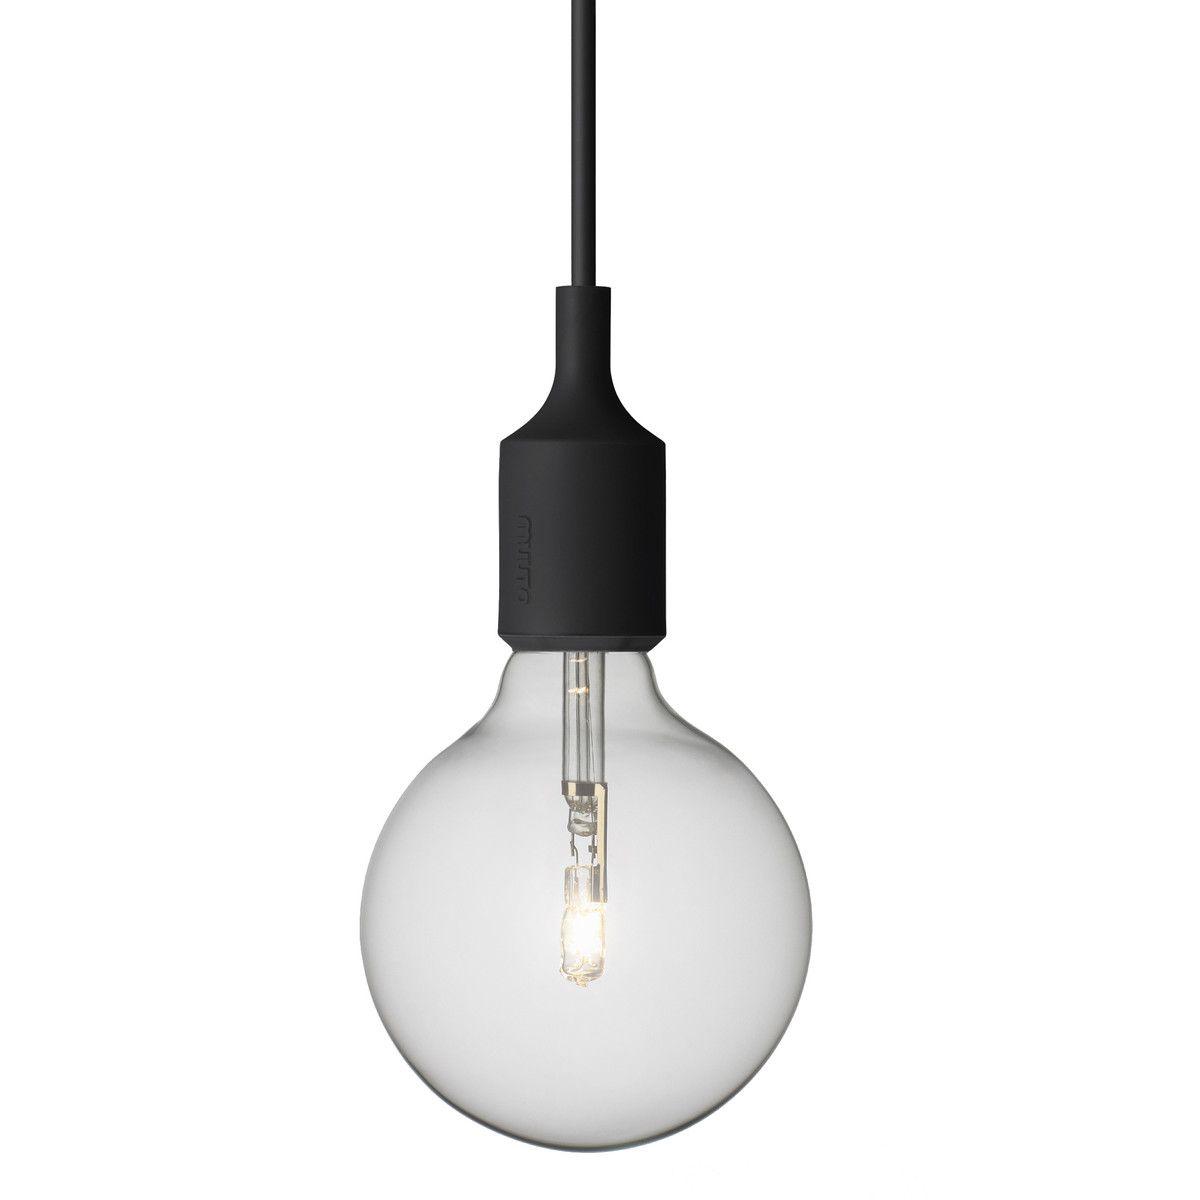 Muuto Leuchte muuto e27 pendant leuchte lights design shop